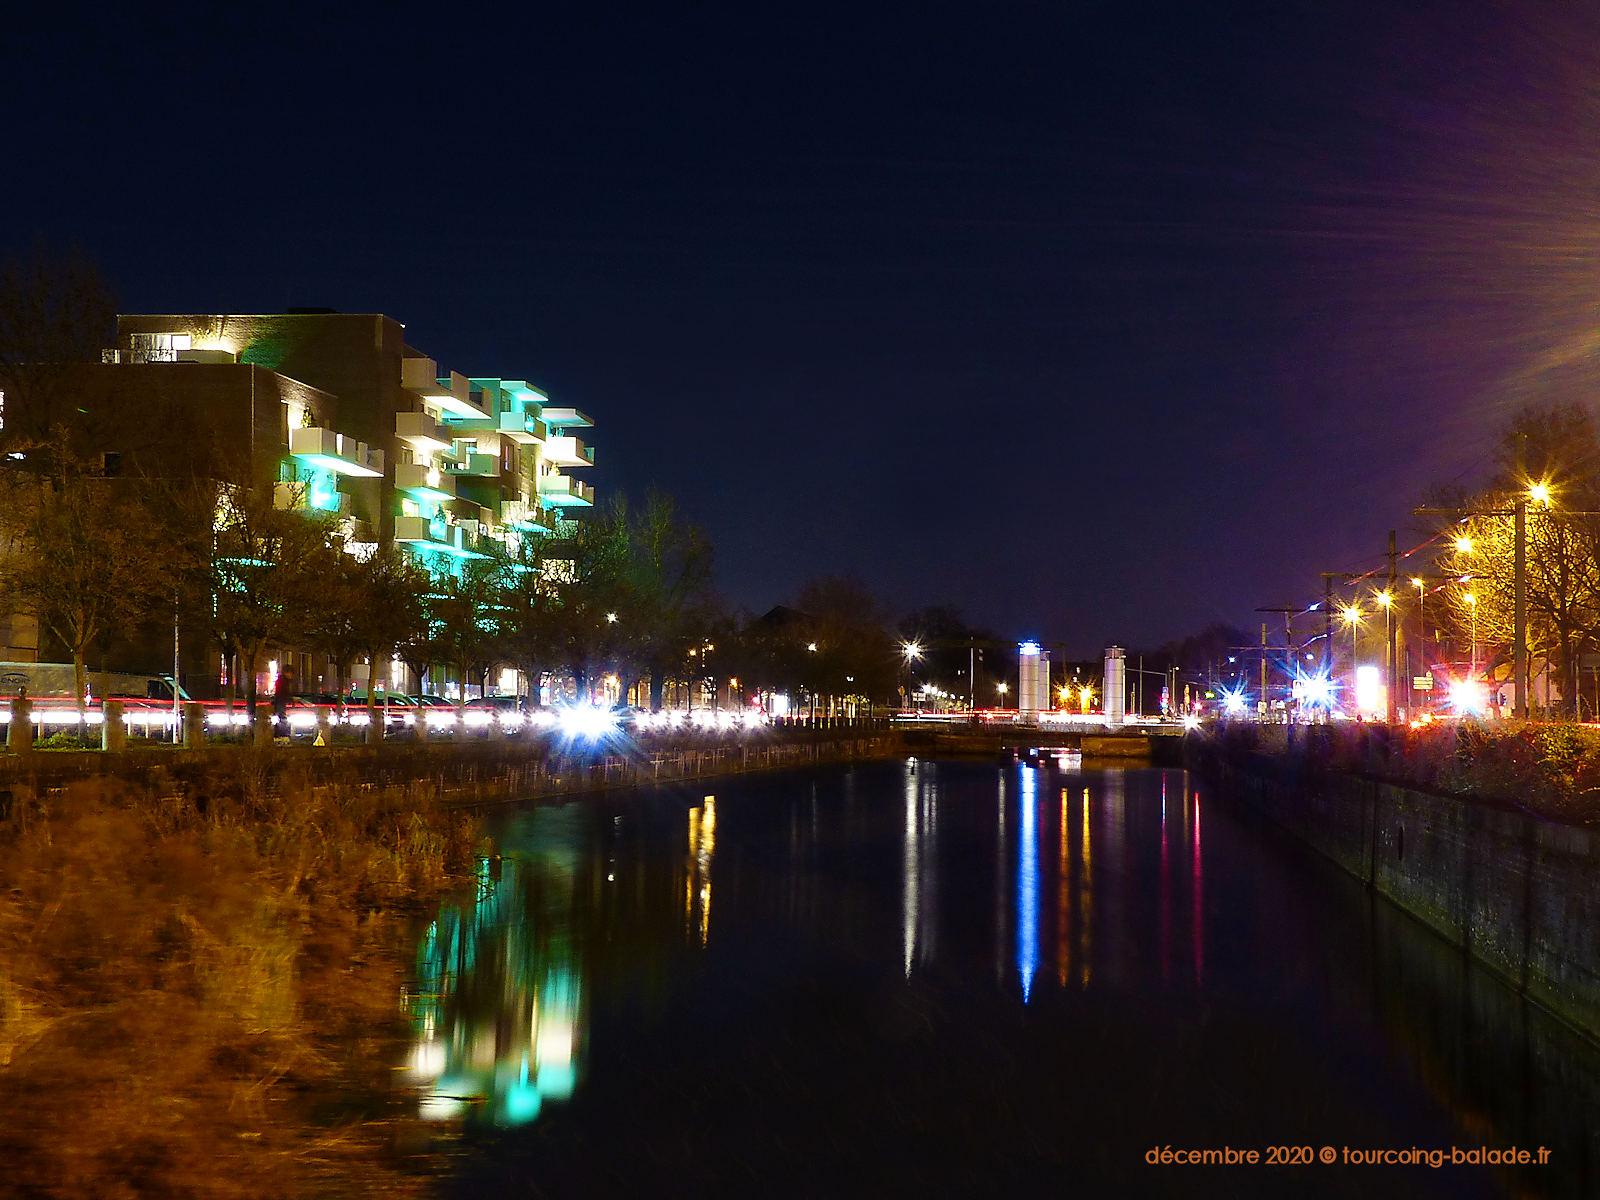 Tourcoing Nuit 2020 - Résidence Equinox